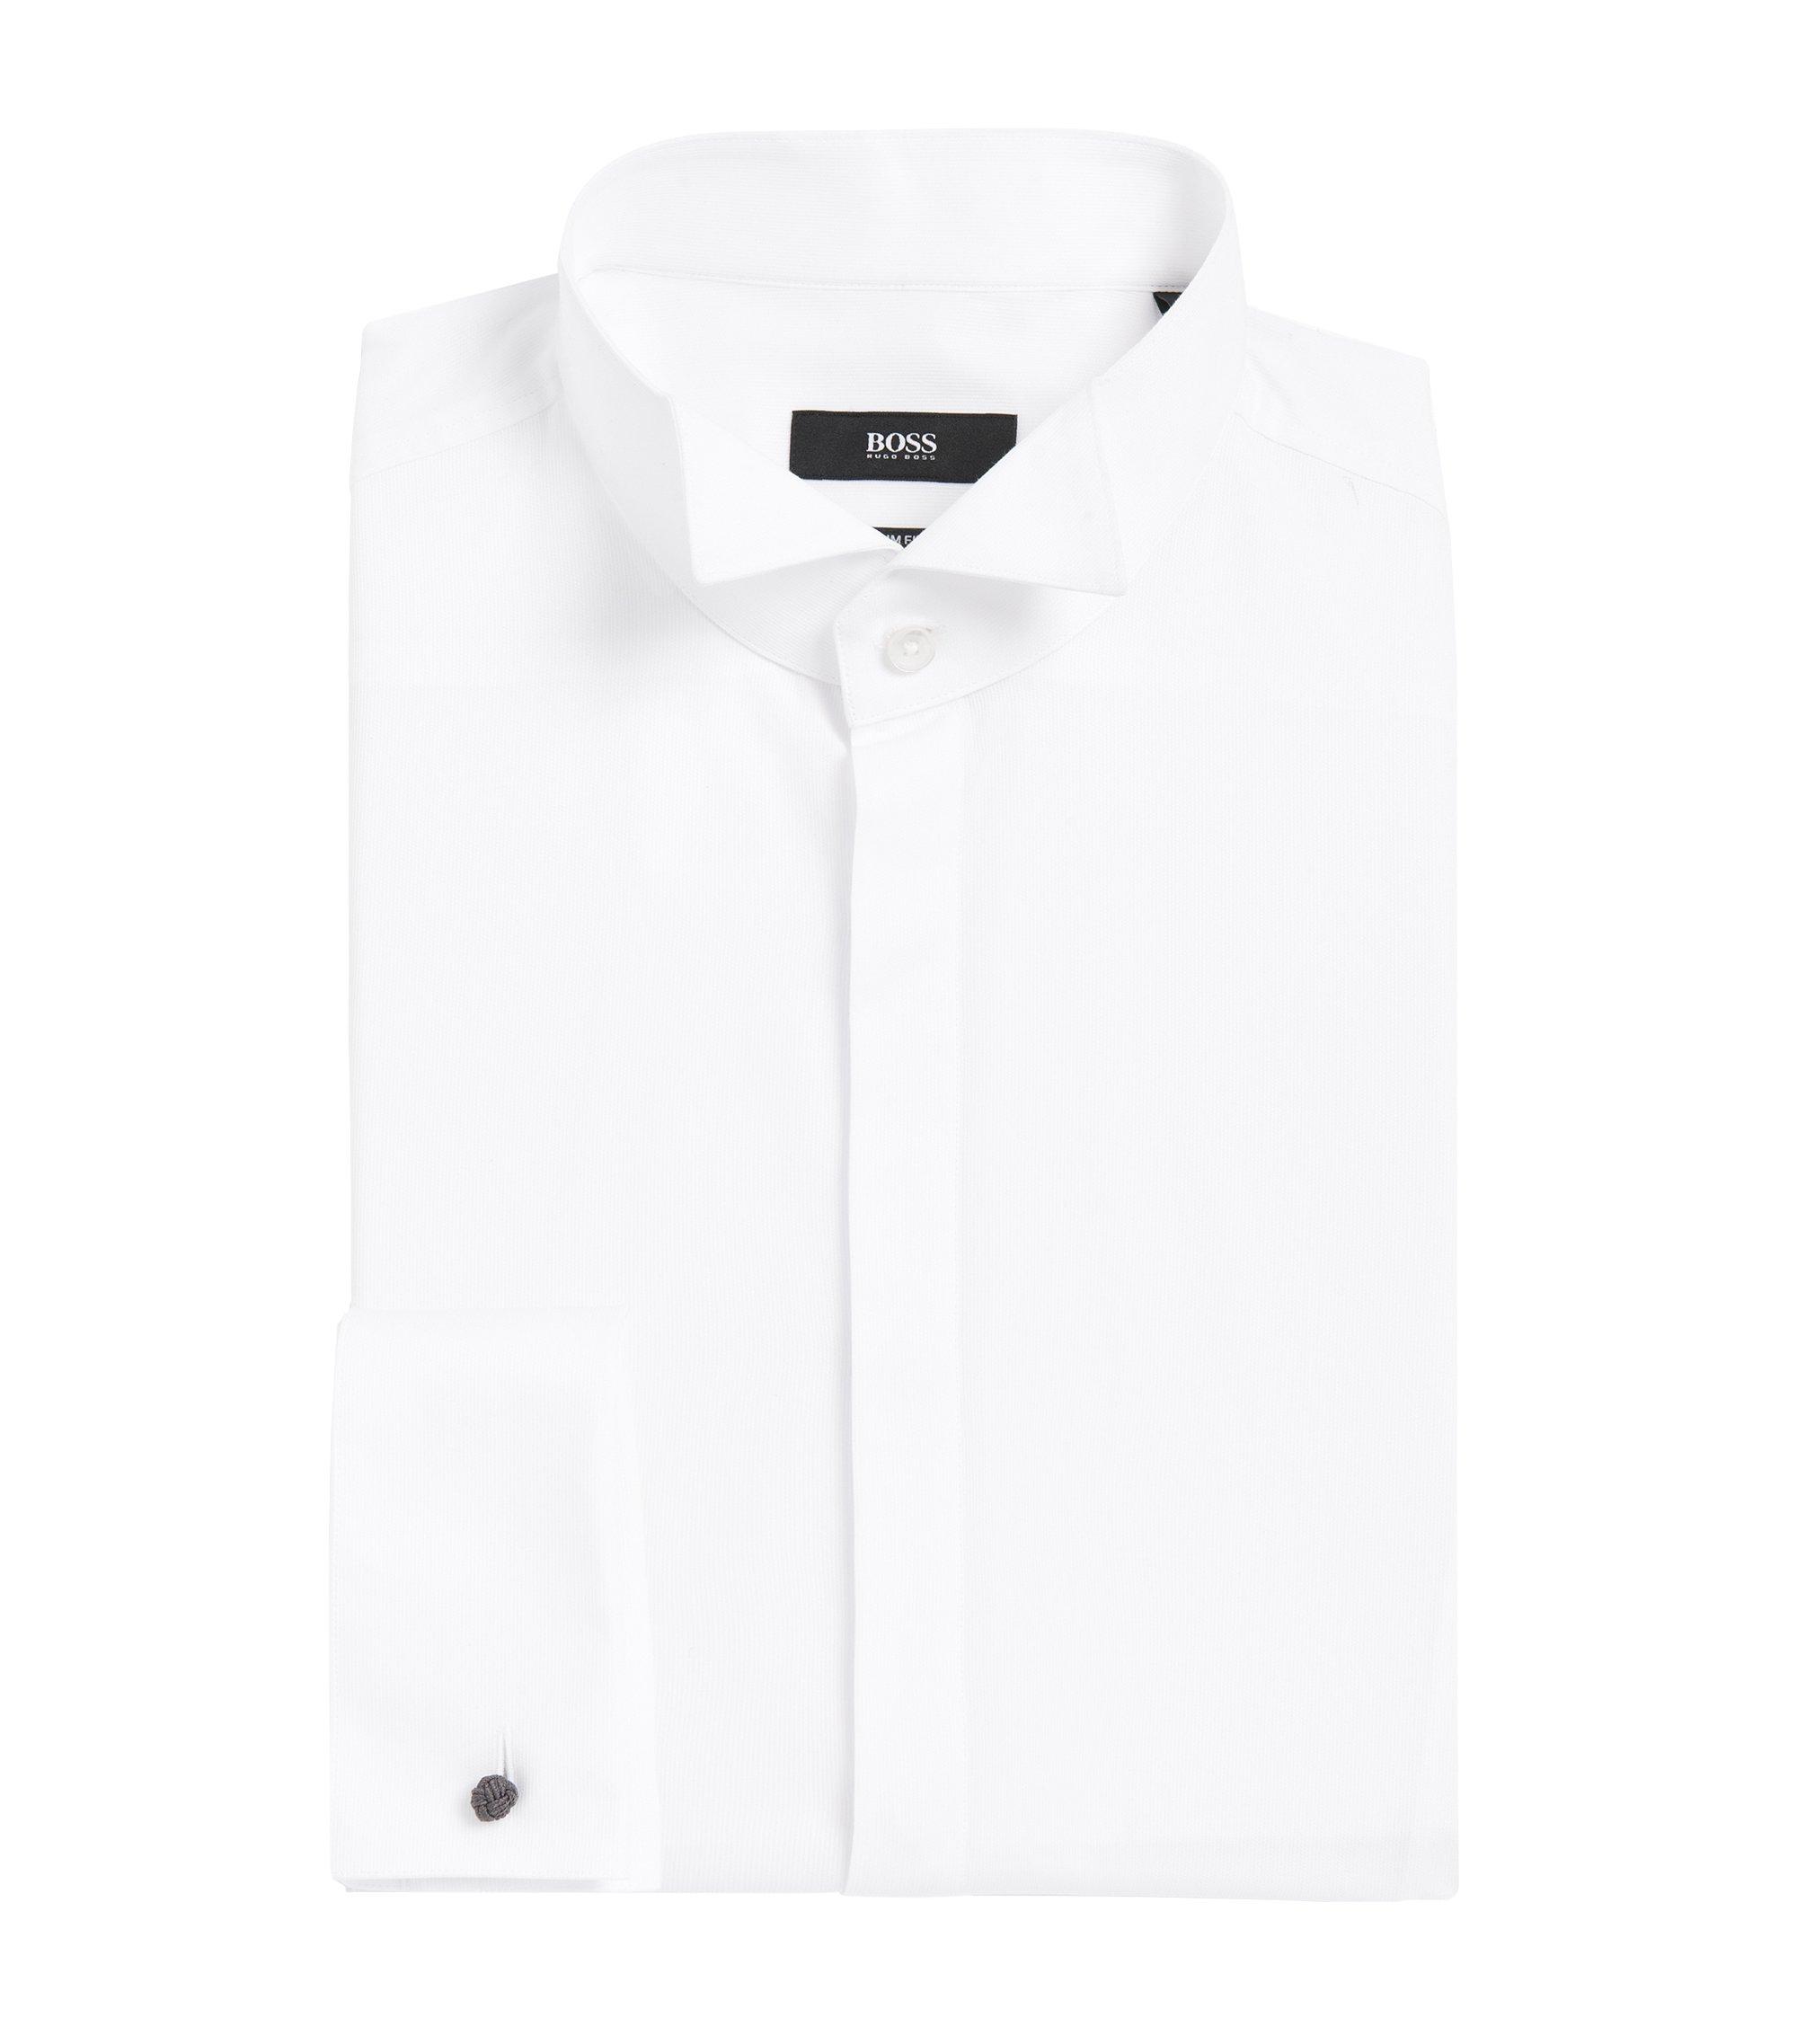 Wingtip Cotton Dress Shirt, Slim Fit | Jillik, White